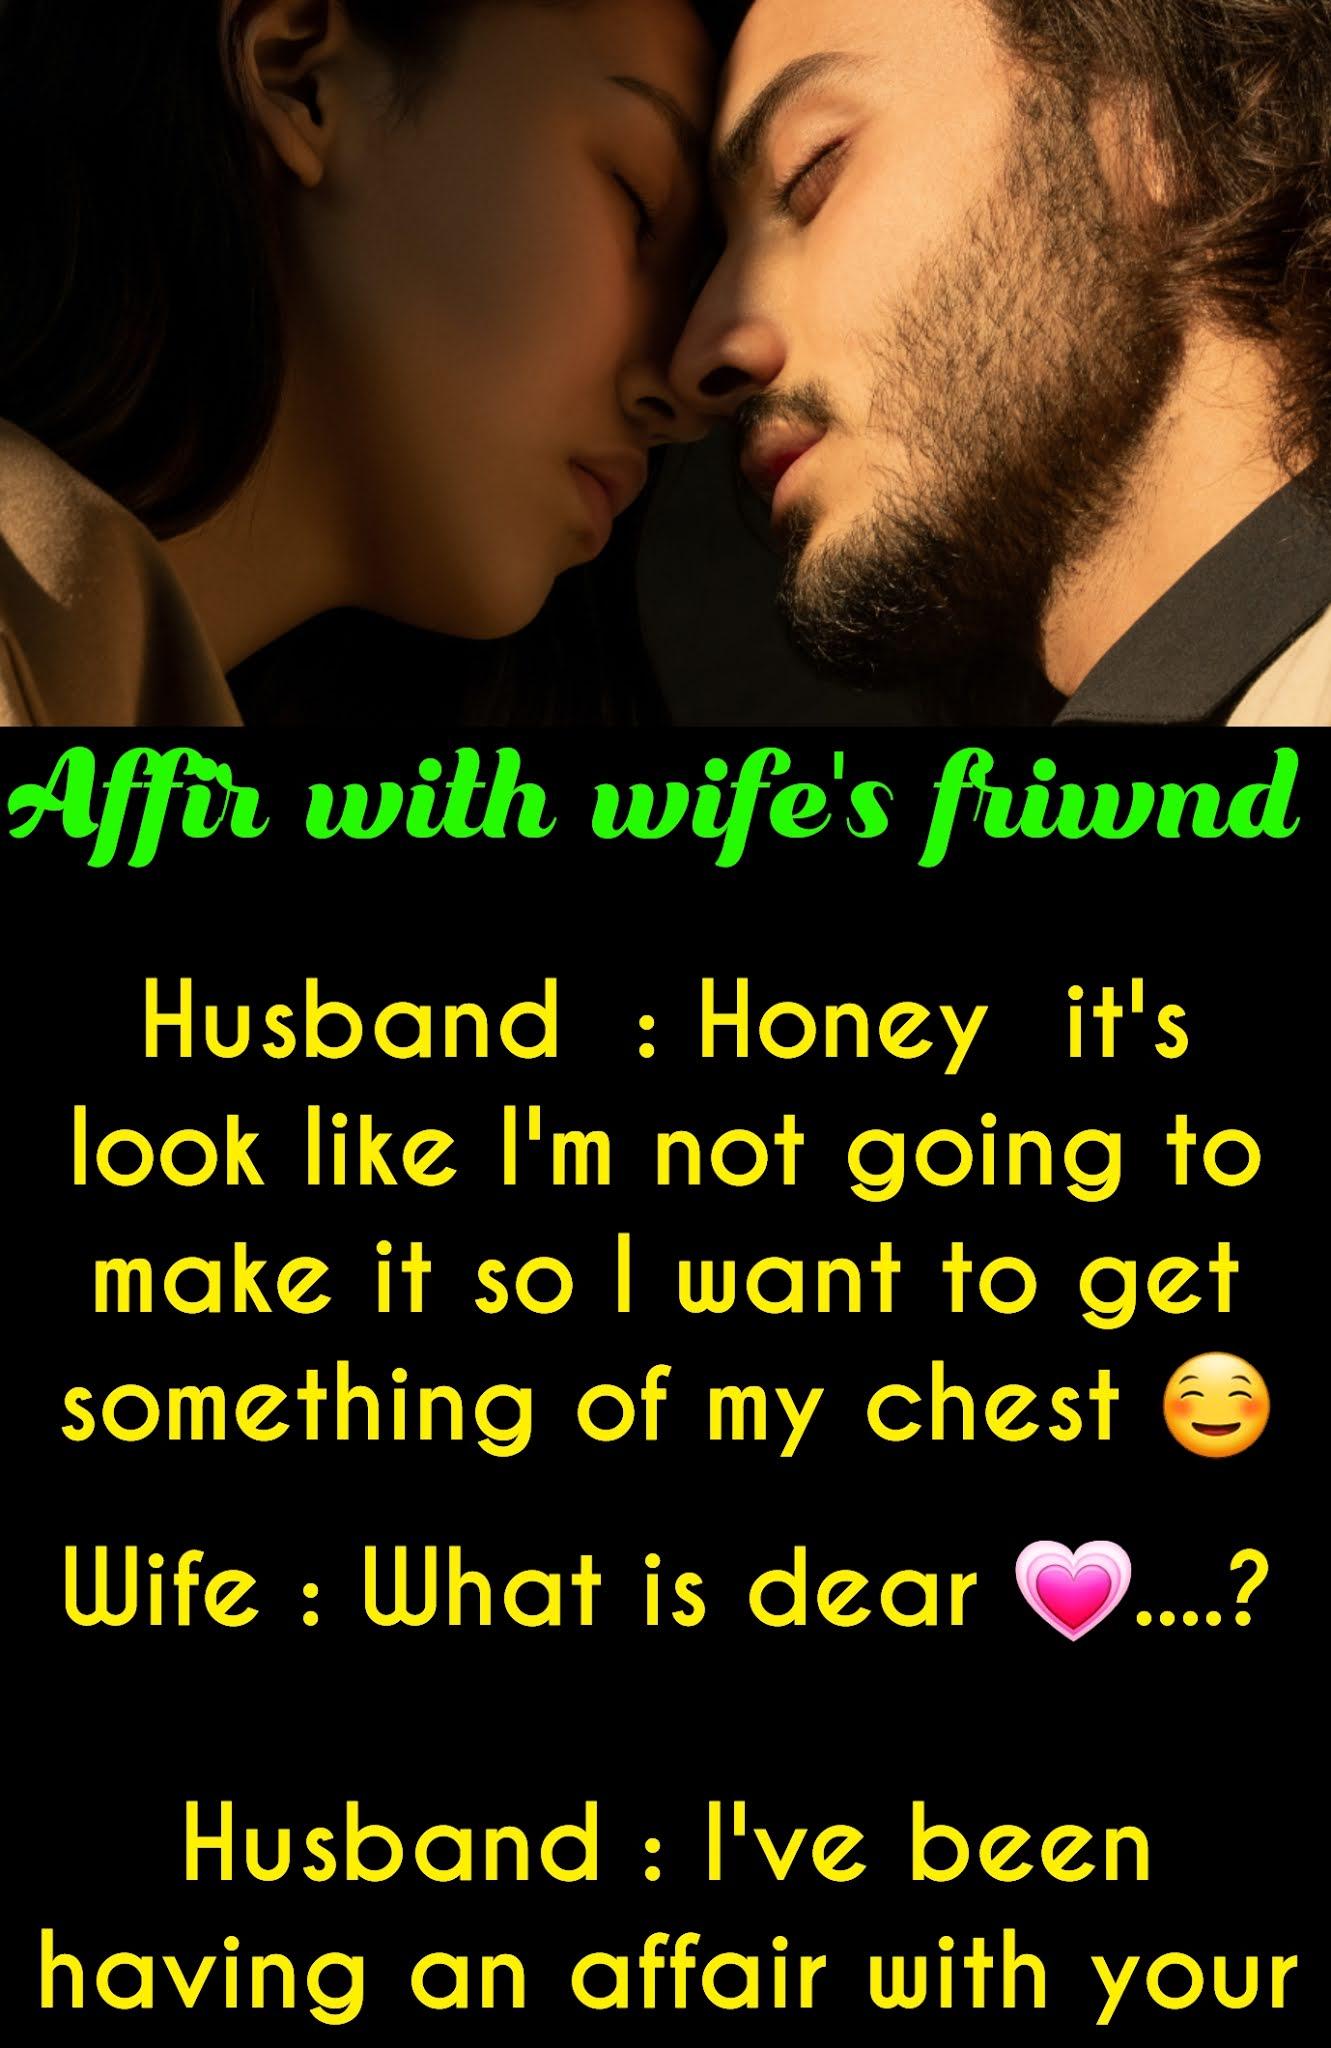 Having friend with wife affair My Emotional